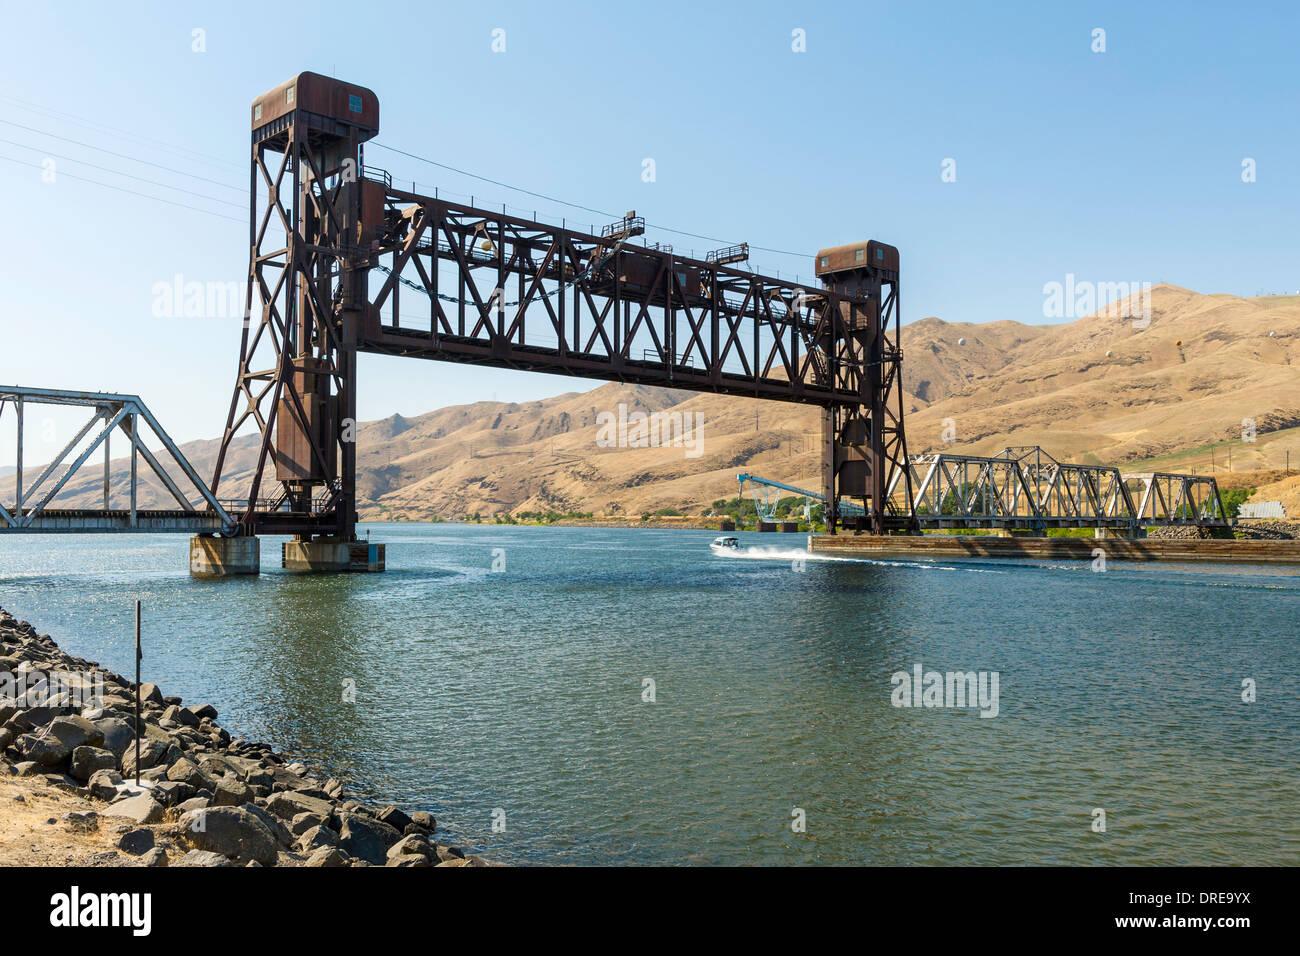 Camas Prairie Railroad Bridge, a vertical Lift railroad bridge, across the Clearwater River, Lewiston, Idaho, USA. - Stock Image